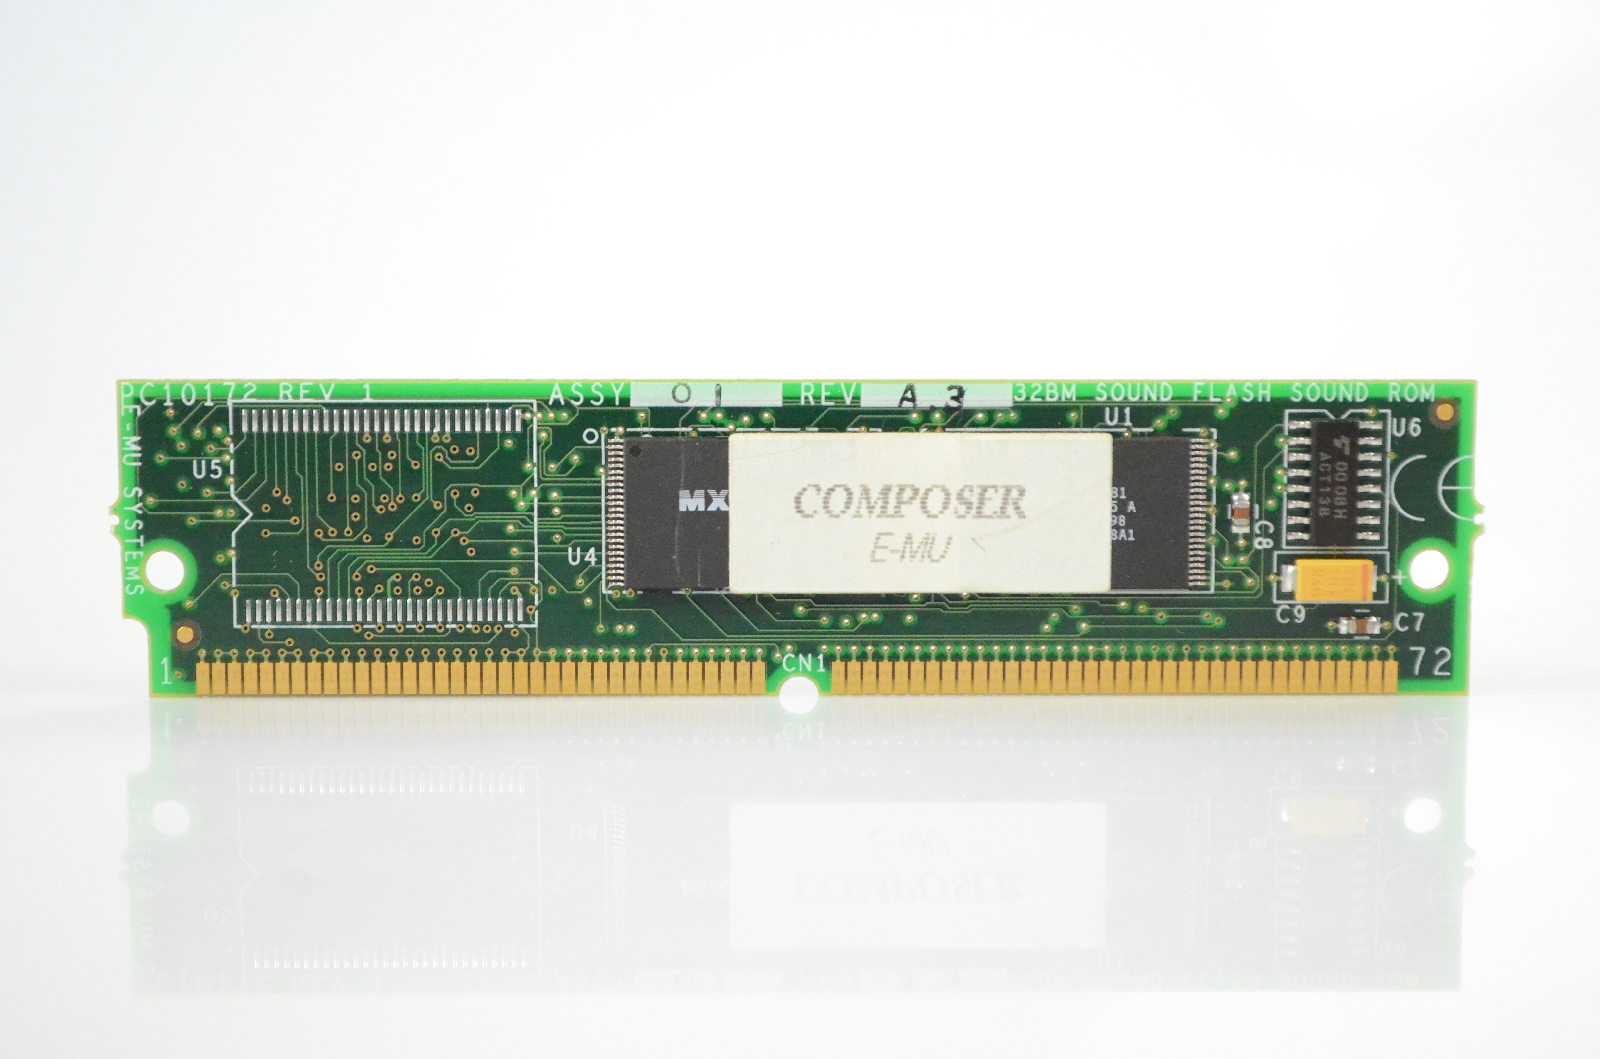 E-MU Composer 32MB Sound Flash ROM Expansion Card #33282